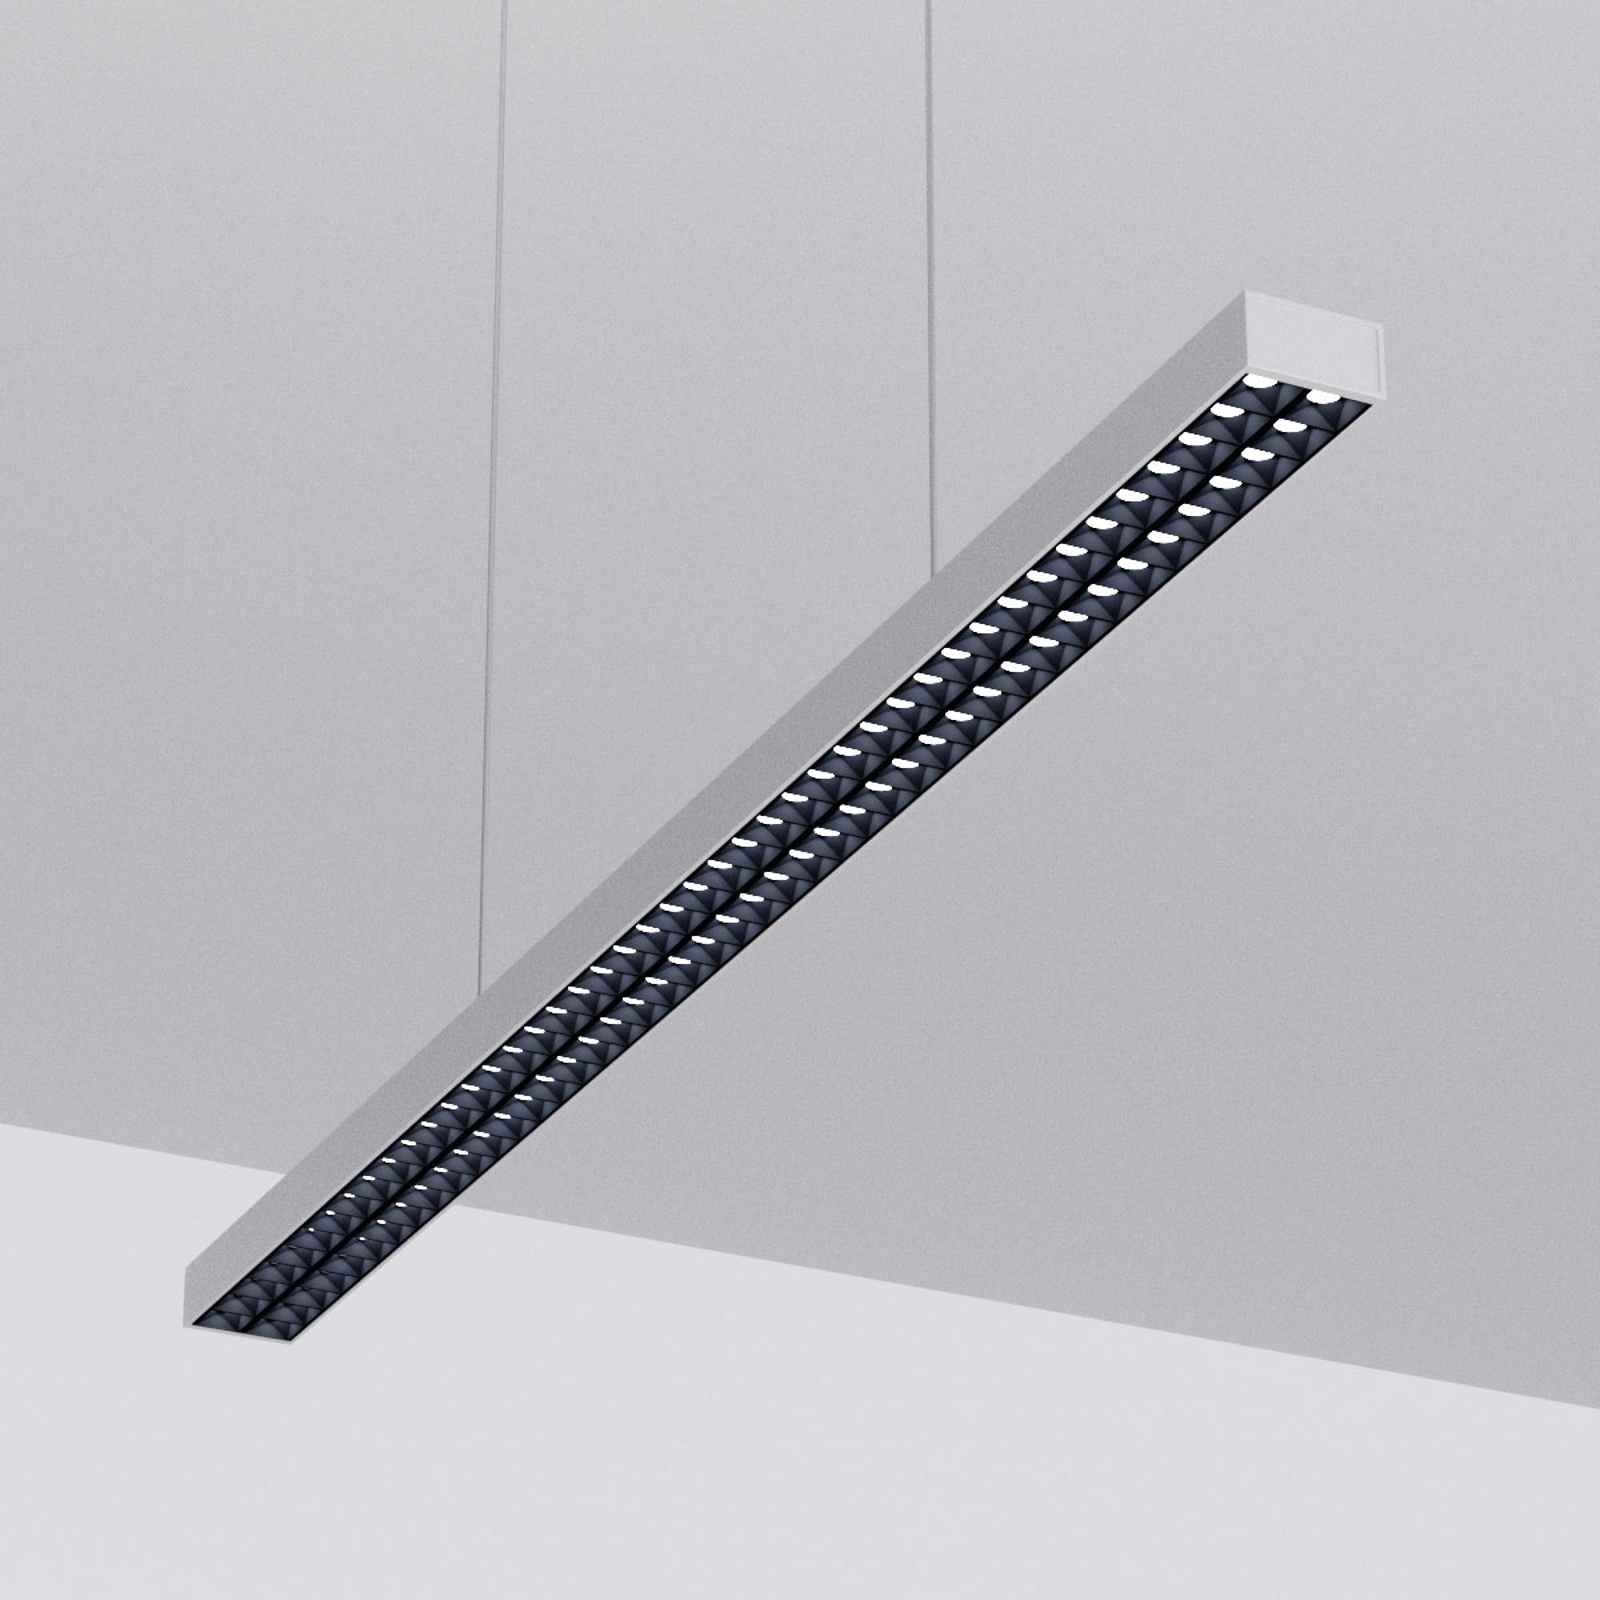 LED-Pendellampe Jolinda fürs Büro, silber